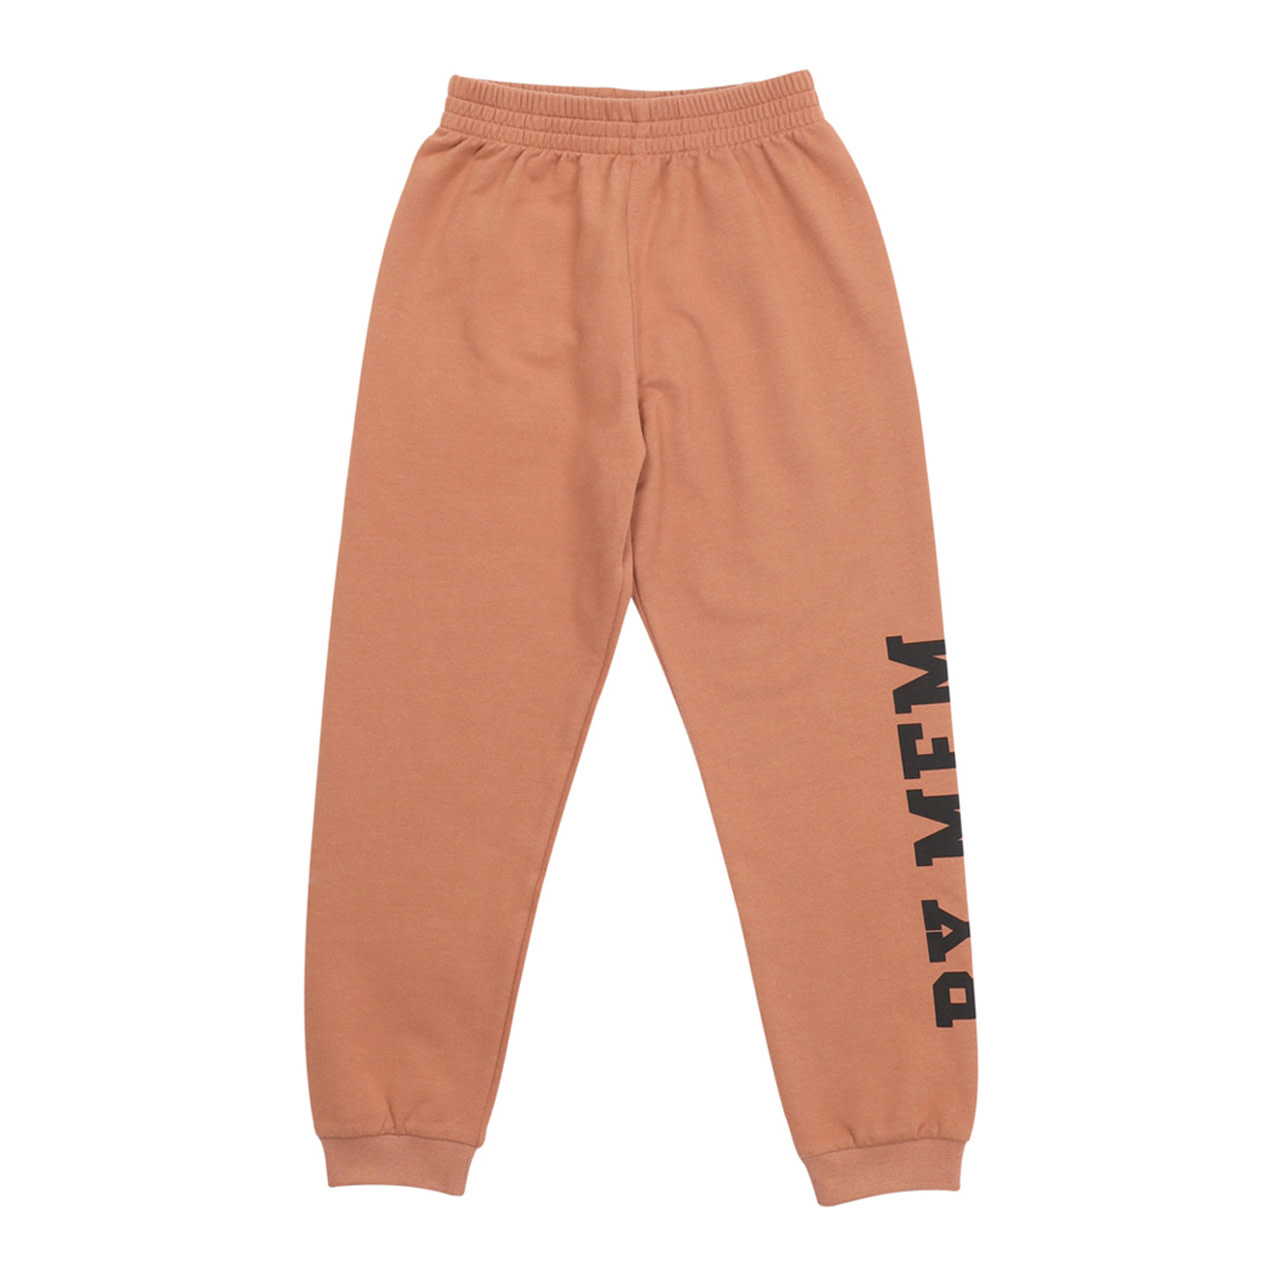 Jogging pants dirty dingo-1